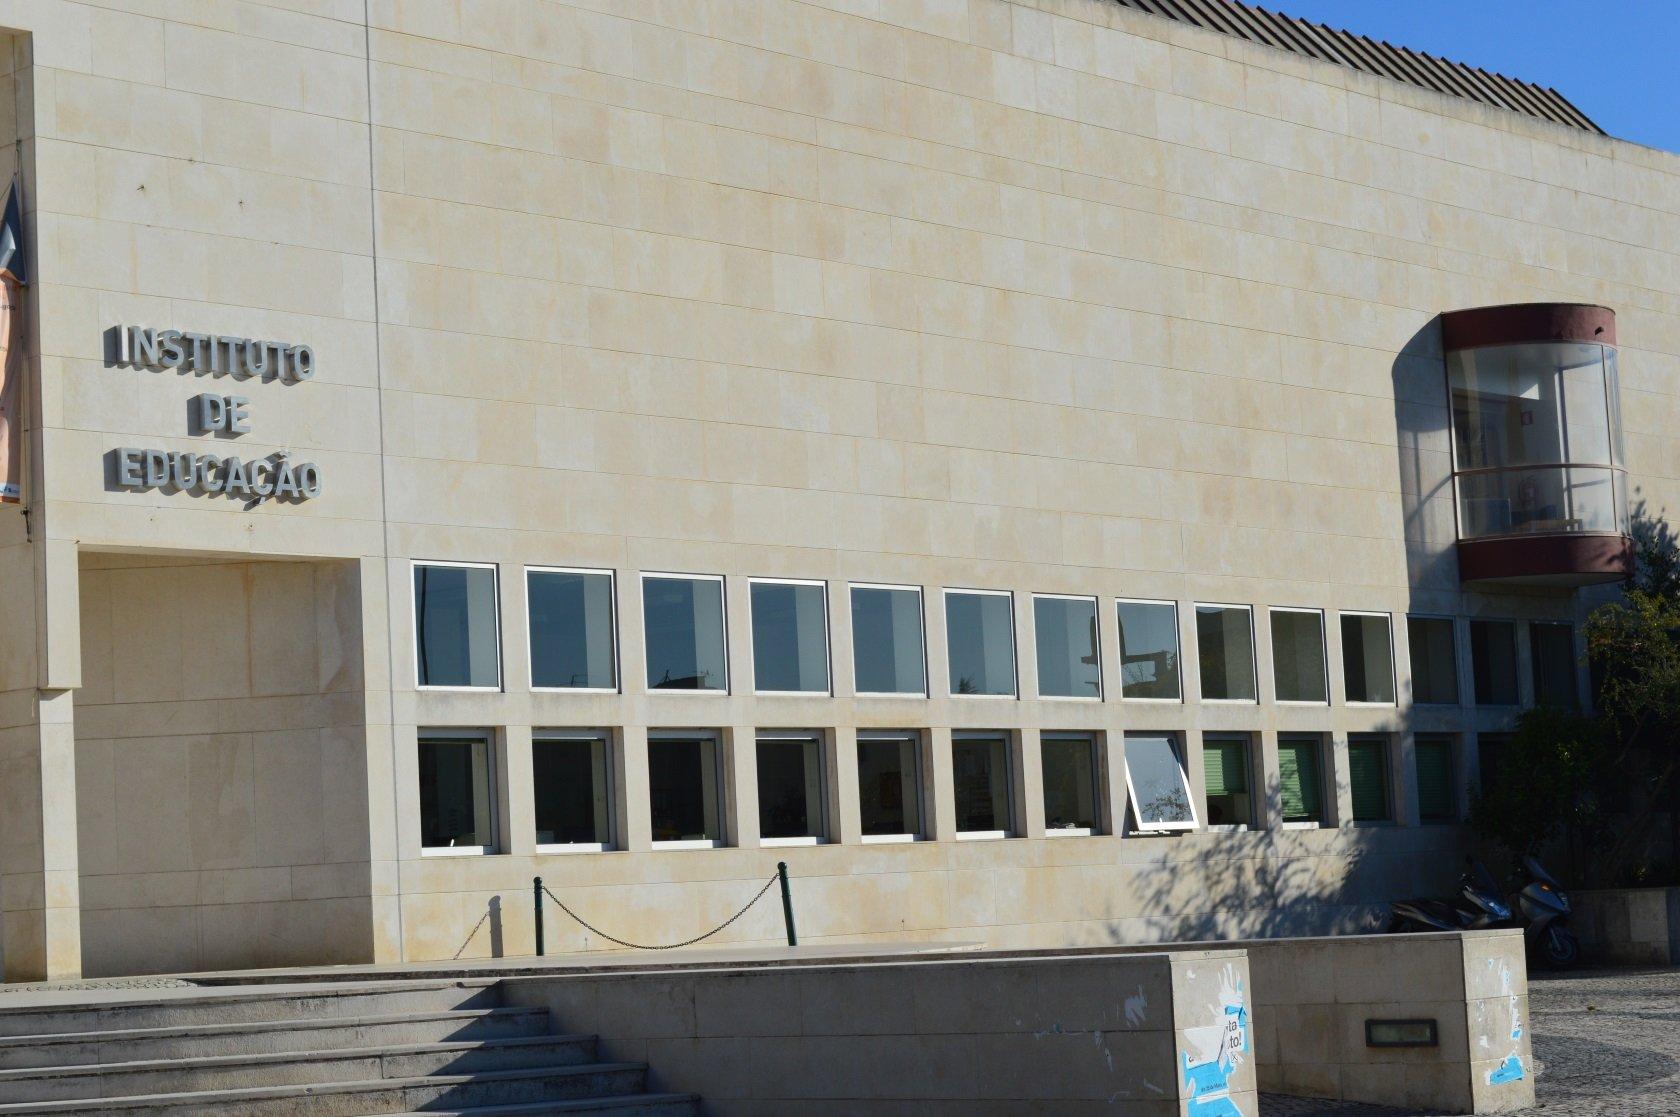 Pormenor da fachada principal do edifício, onde se lê